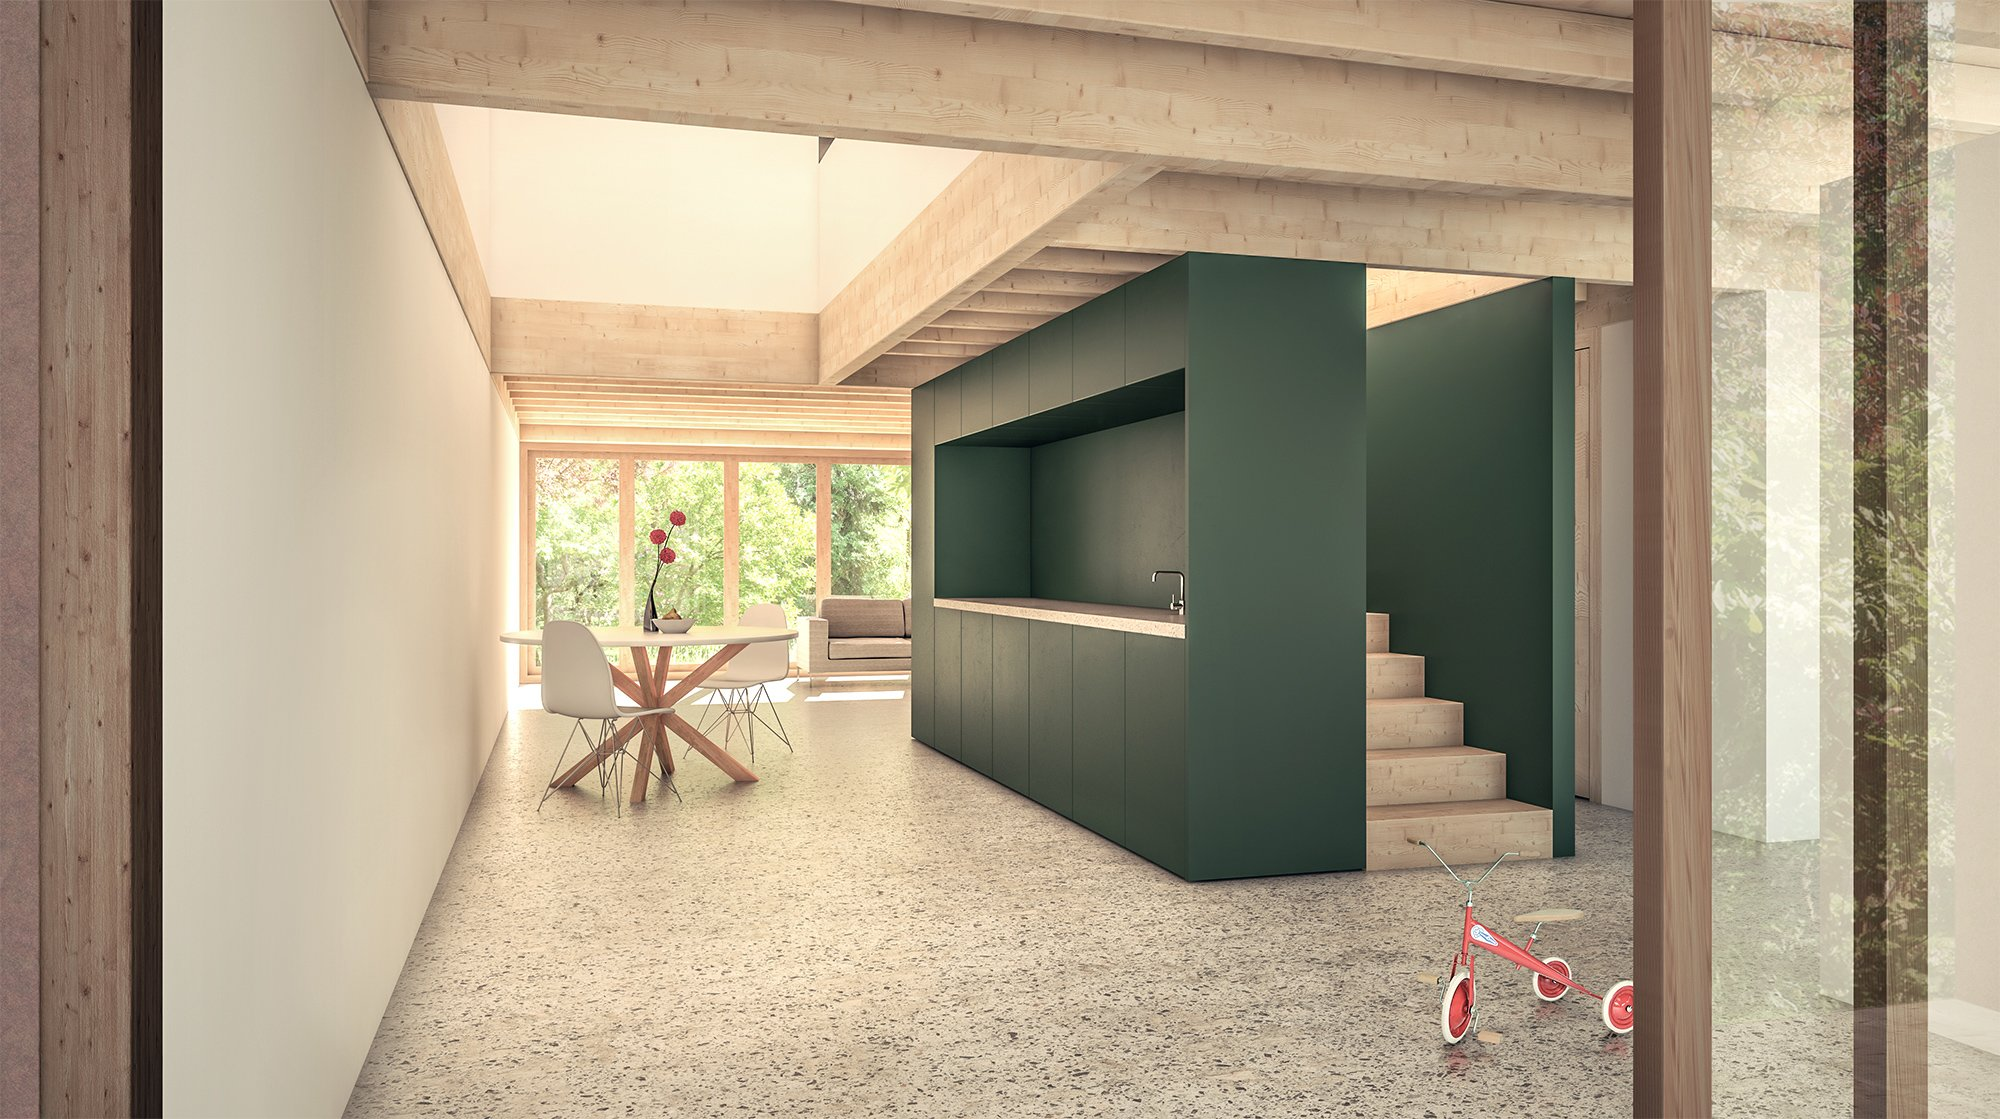 Wohnueberbauung Koelliken Innen ikonaut